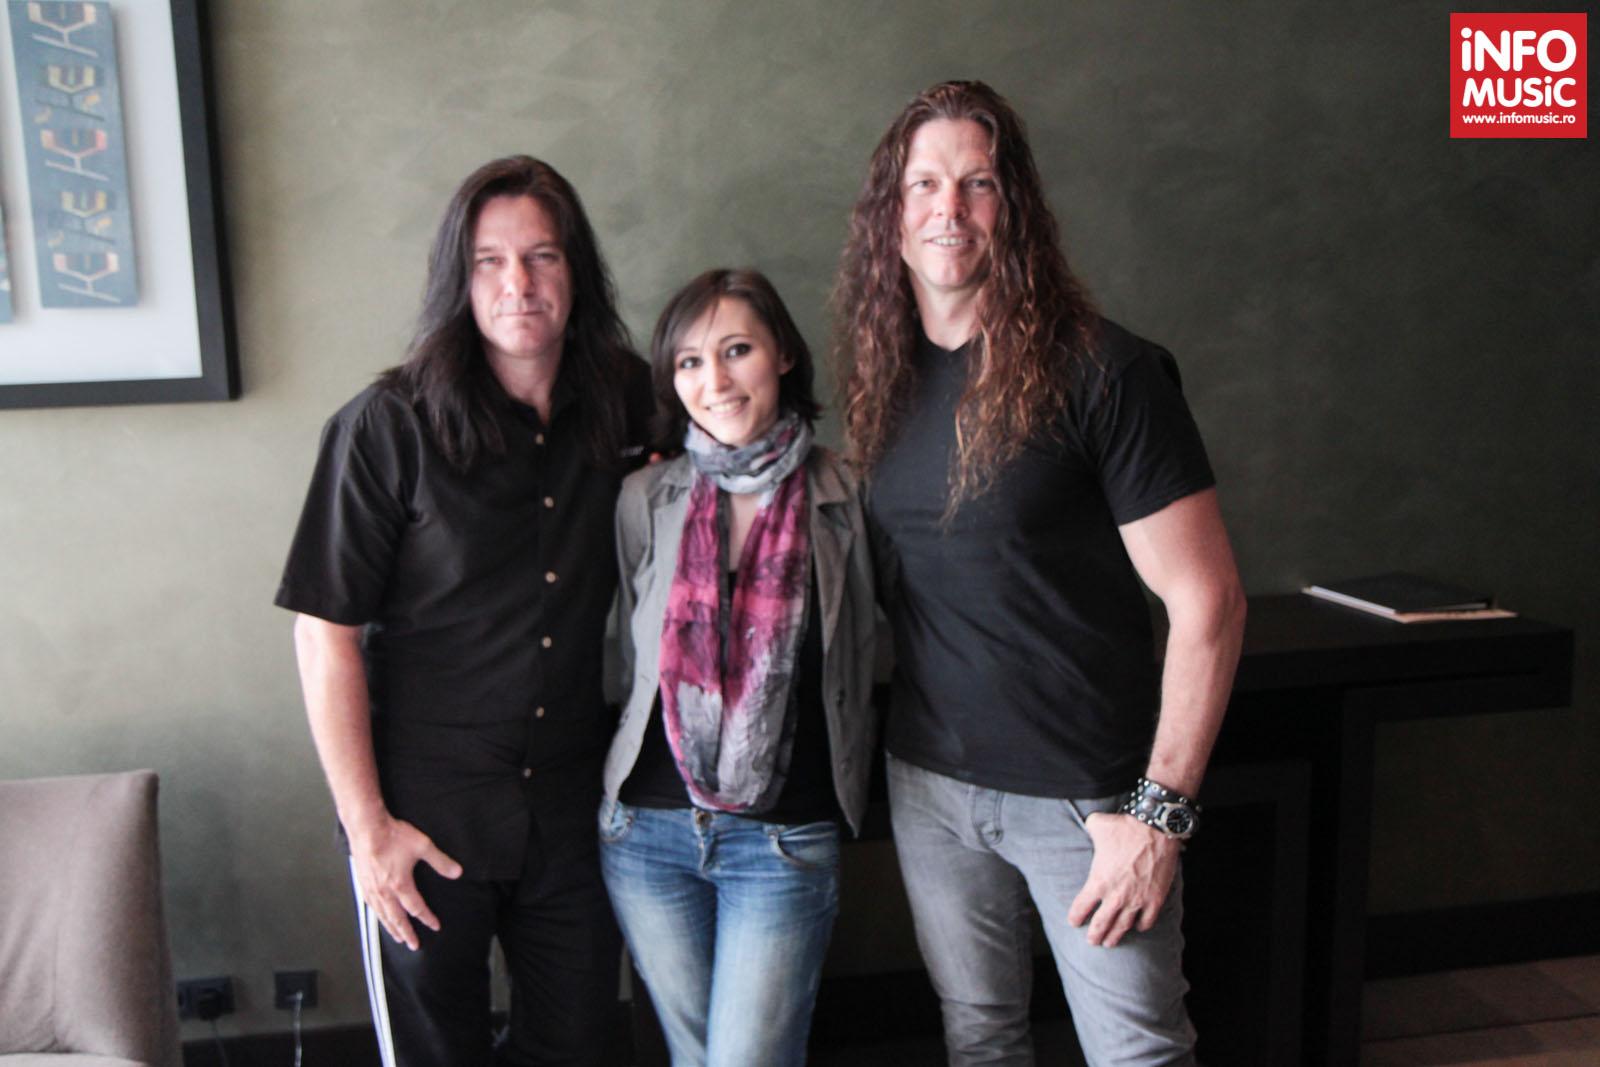 Shawn Drover și Chris Broderick (MEGADETH) intervievați de Alexandra Necula (InfoMusic.ro)